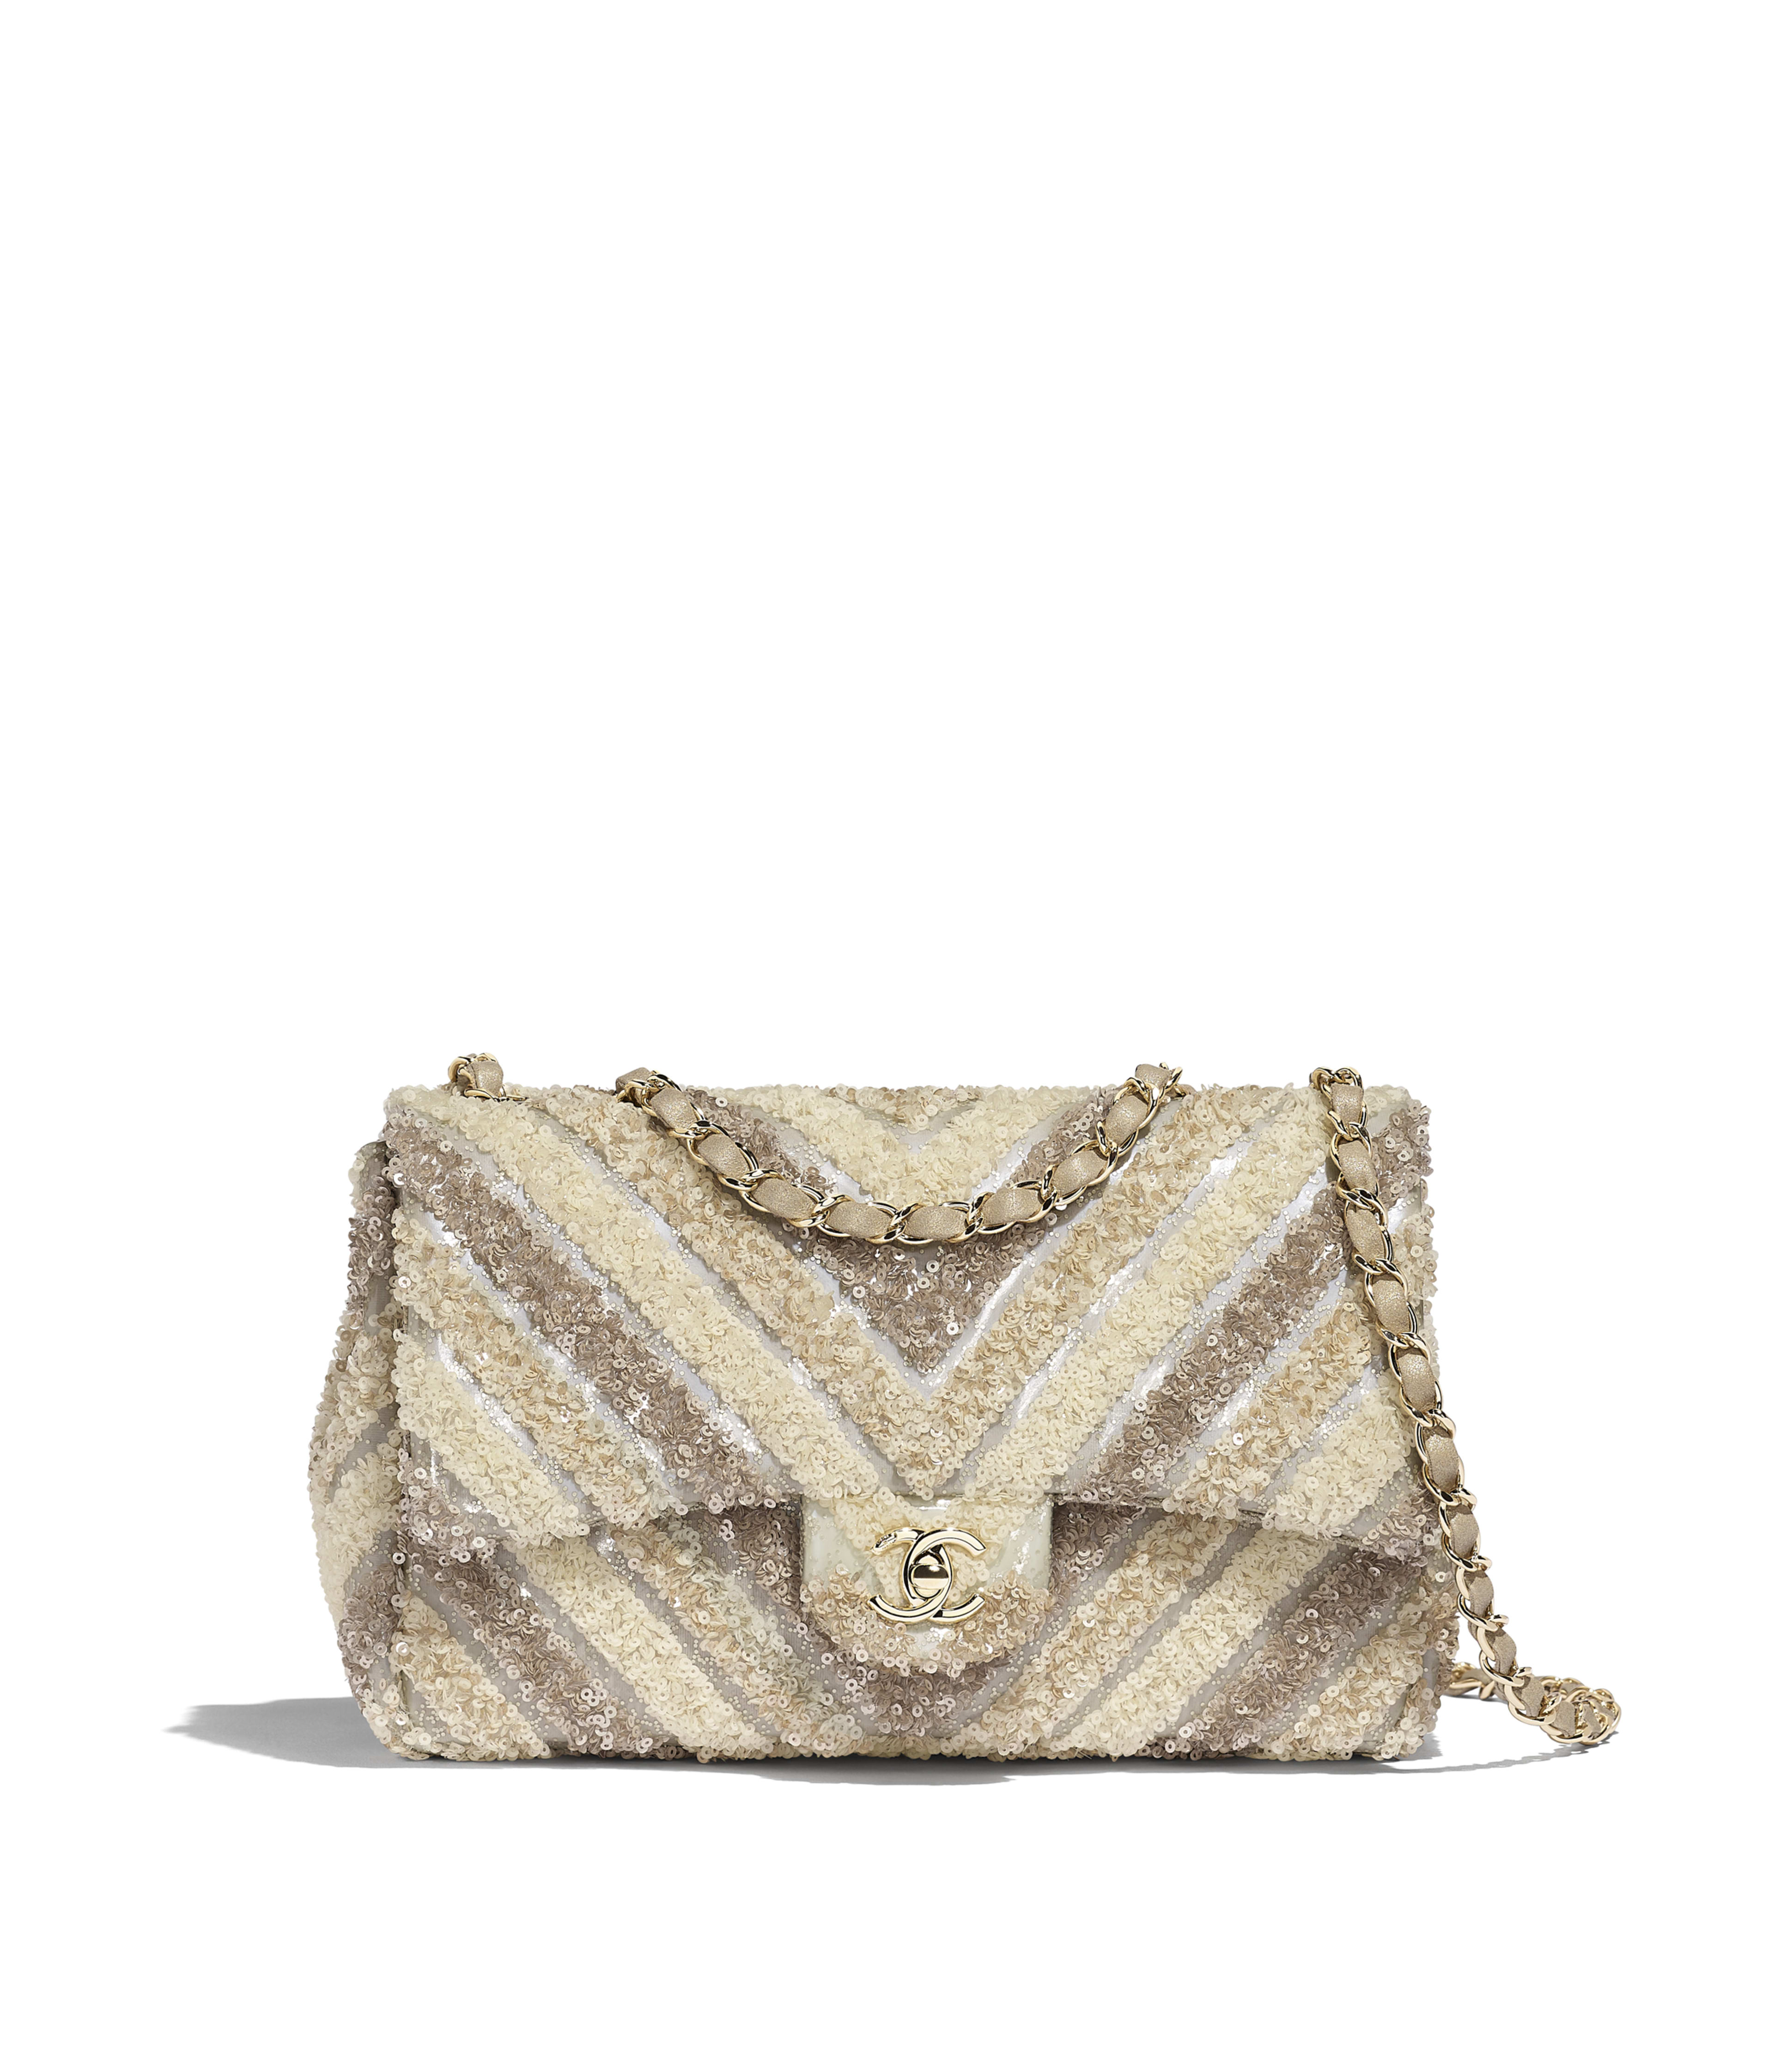 d0542bfb6fe82c Flap Bag PVC, Sequins & Gold-Tone Metal, White Ref. AS0543B0051410601